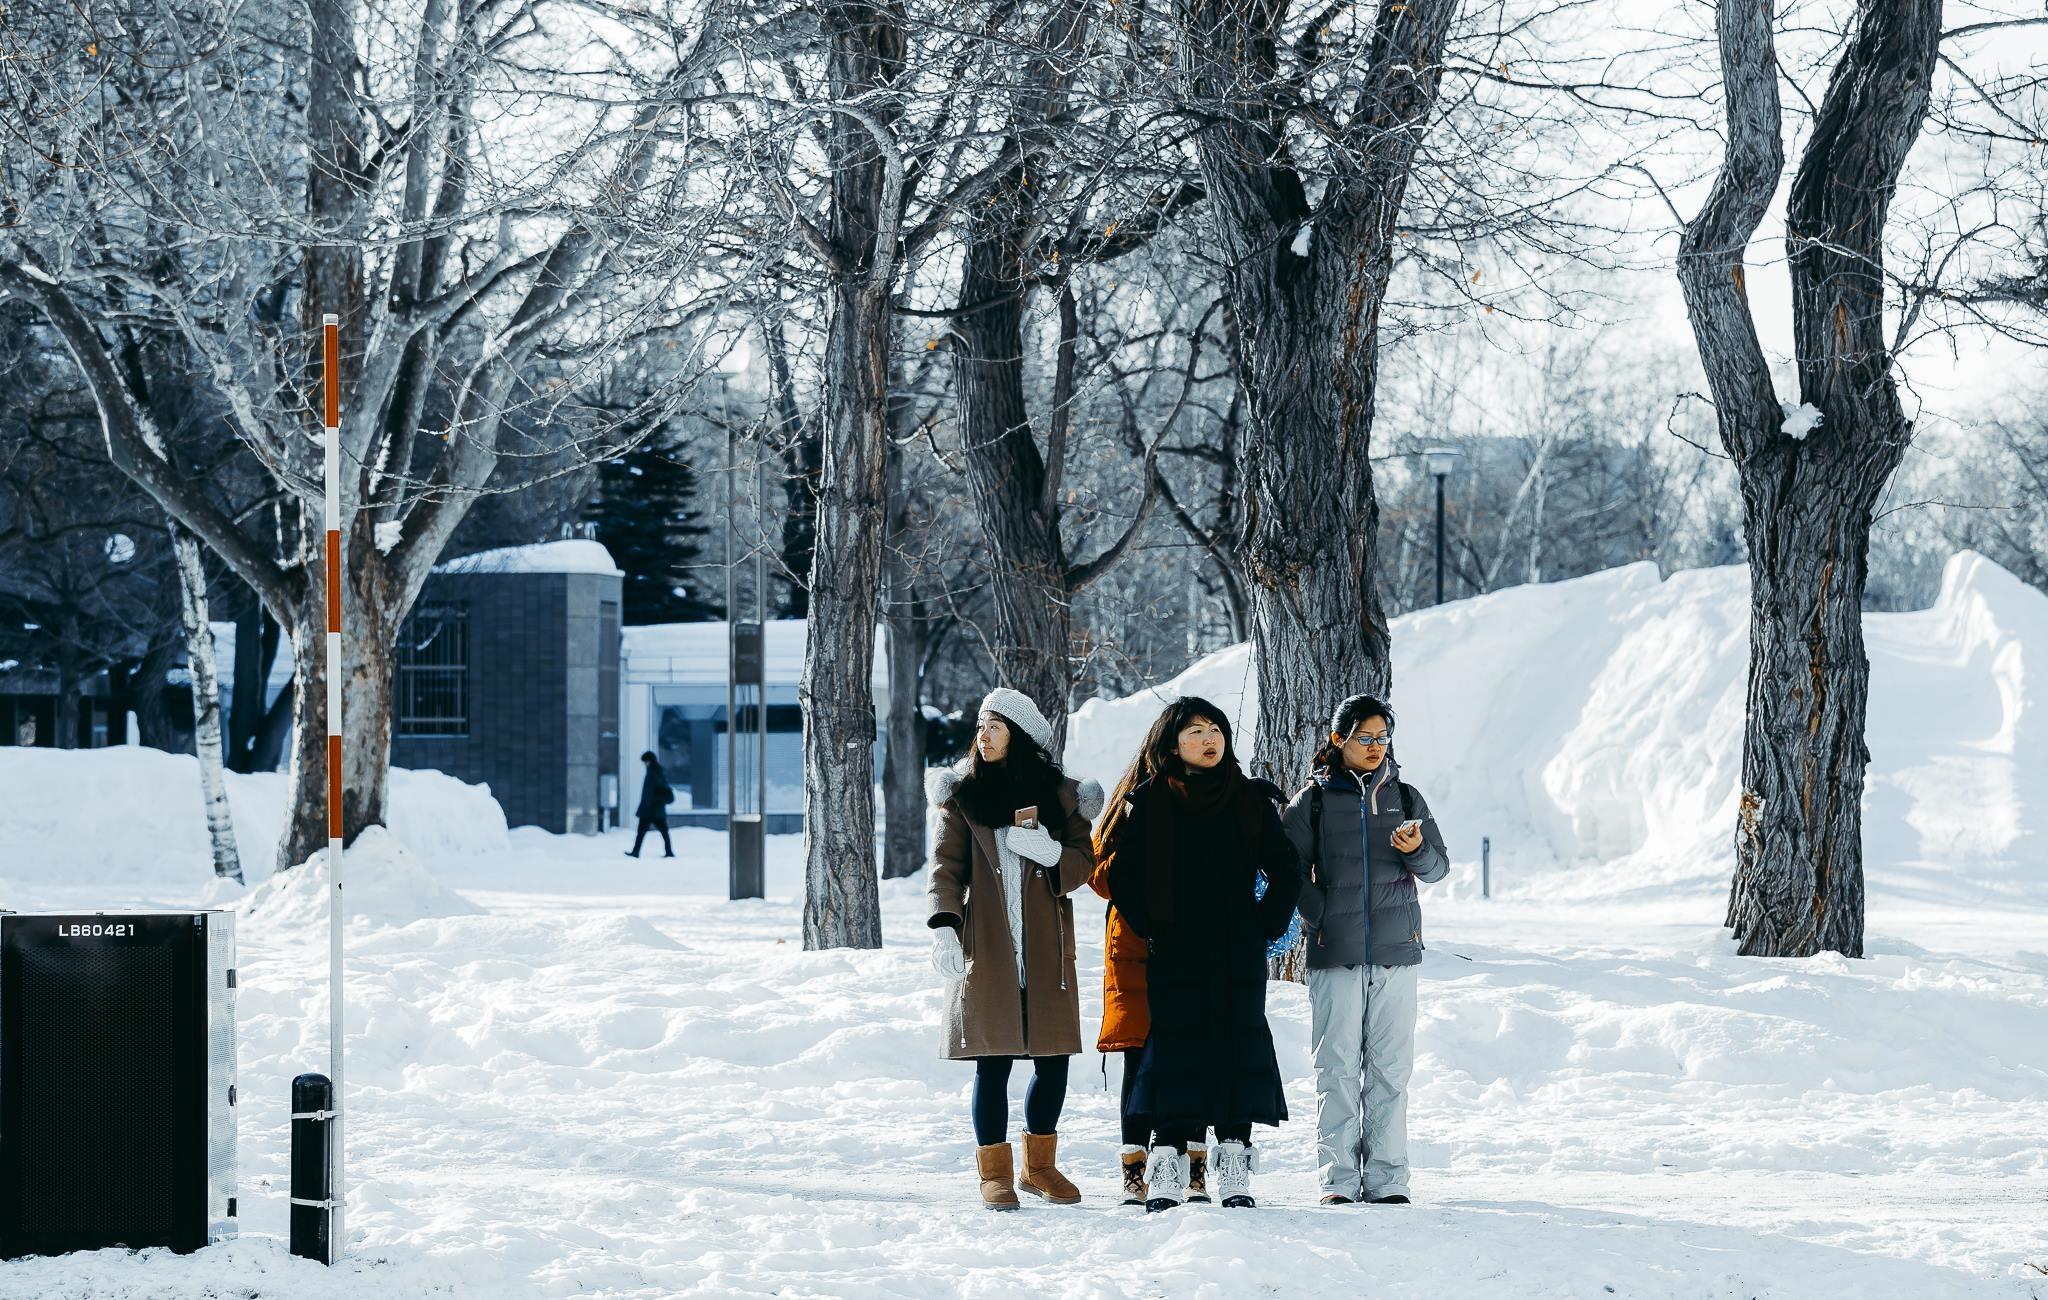 Hokkaido tuyet trang, noi dang den nhat mua dong o Nhat Ban hinh anh 36